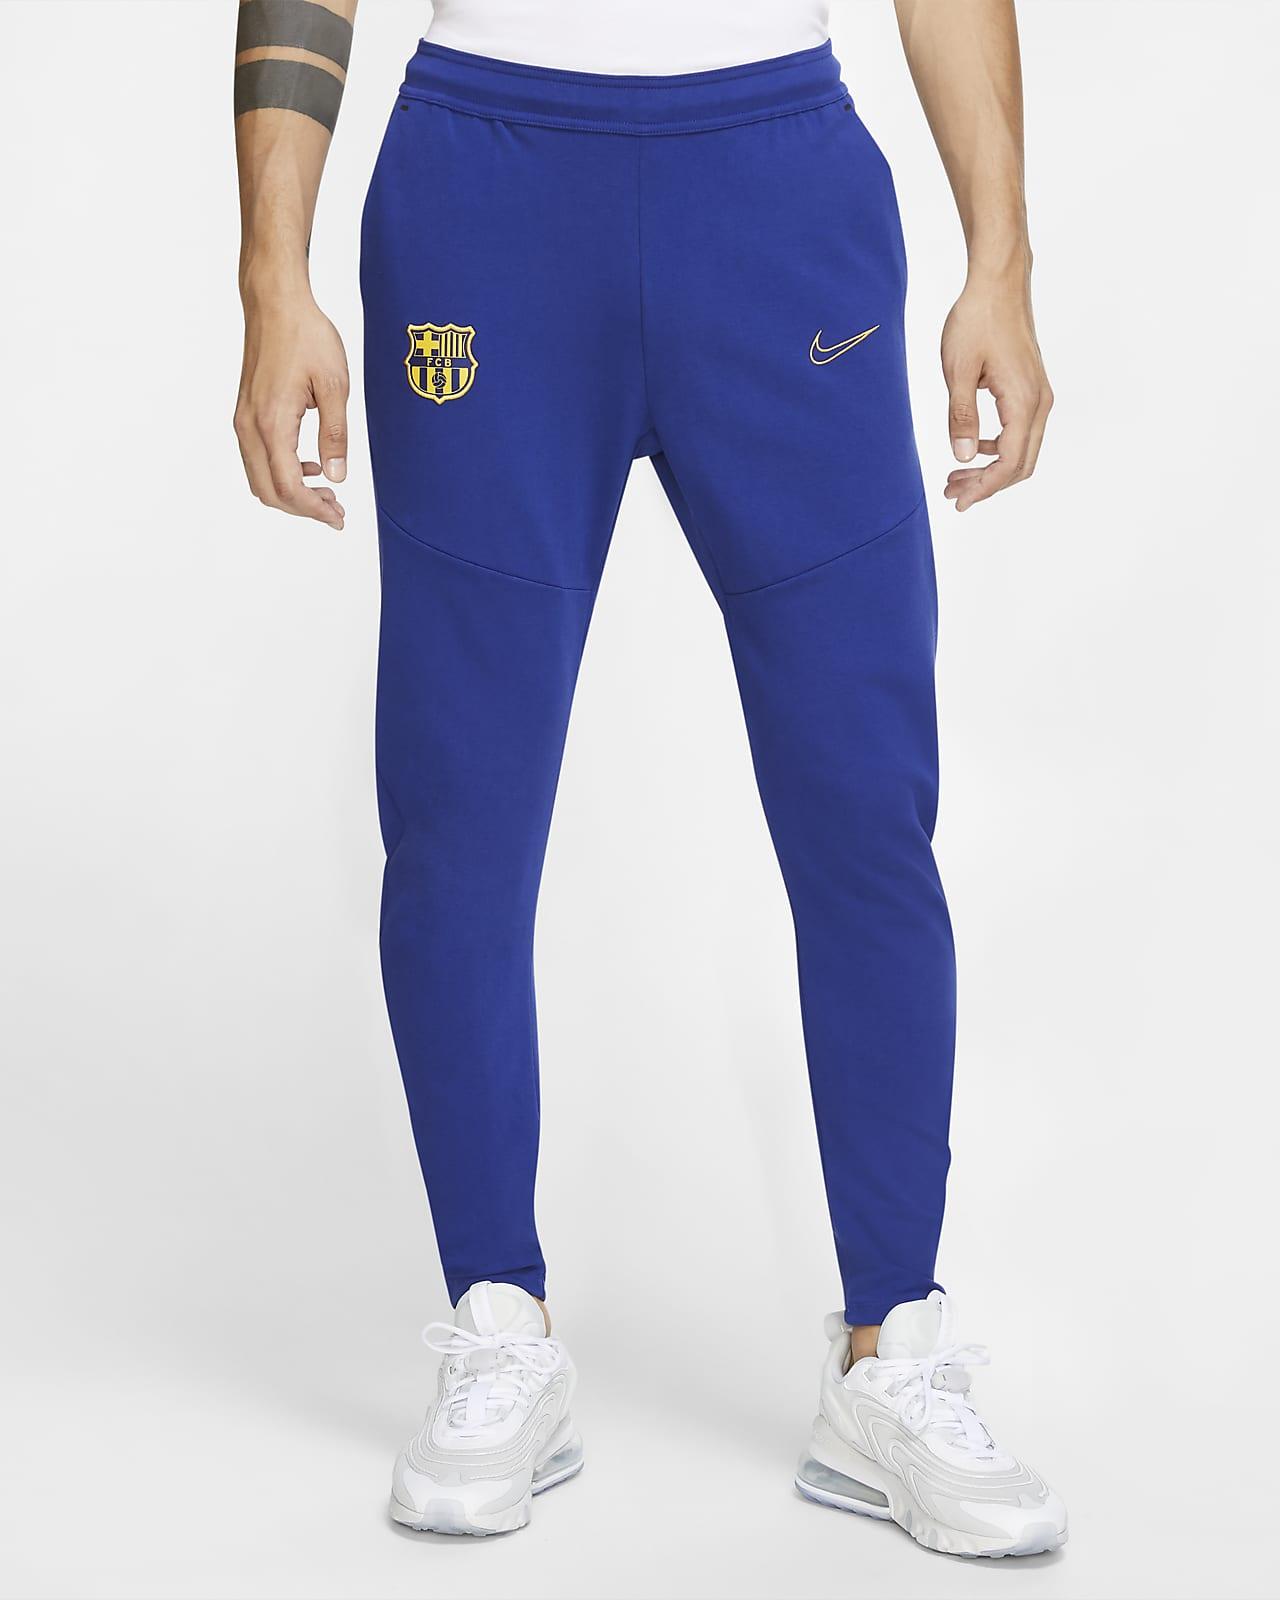 F.C. Barcelona Tech Pack Men's Pants